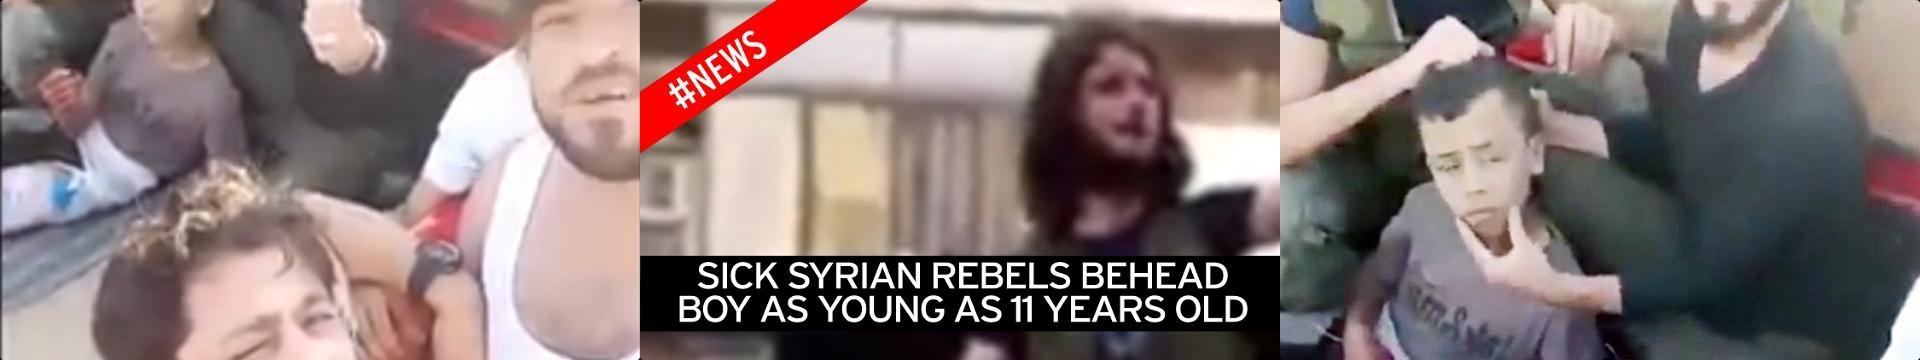 Sumber Gambar : The Mirror.co.uk/news/uk-news/uk-backed-syrian-rebels-behead